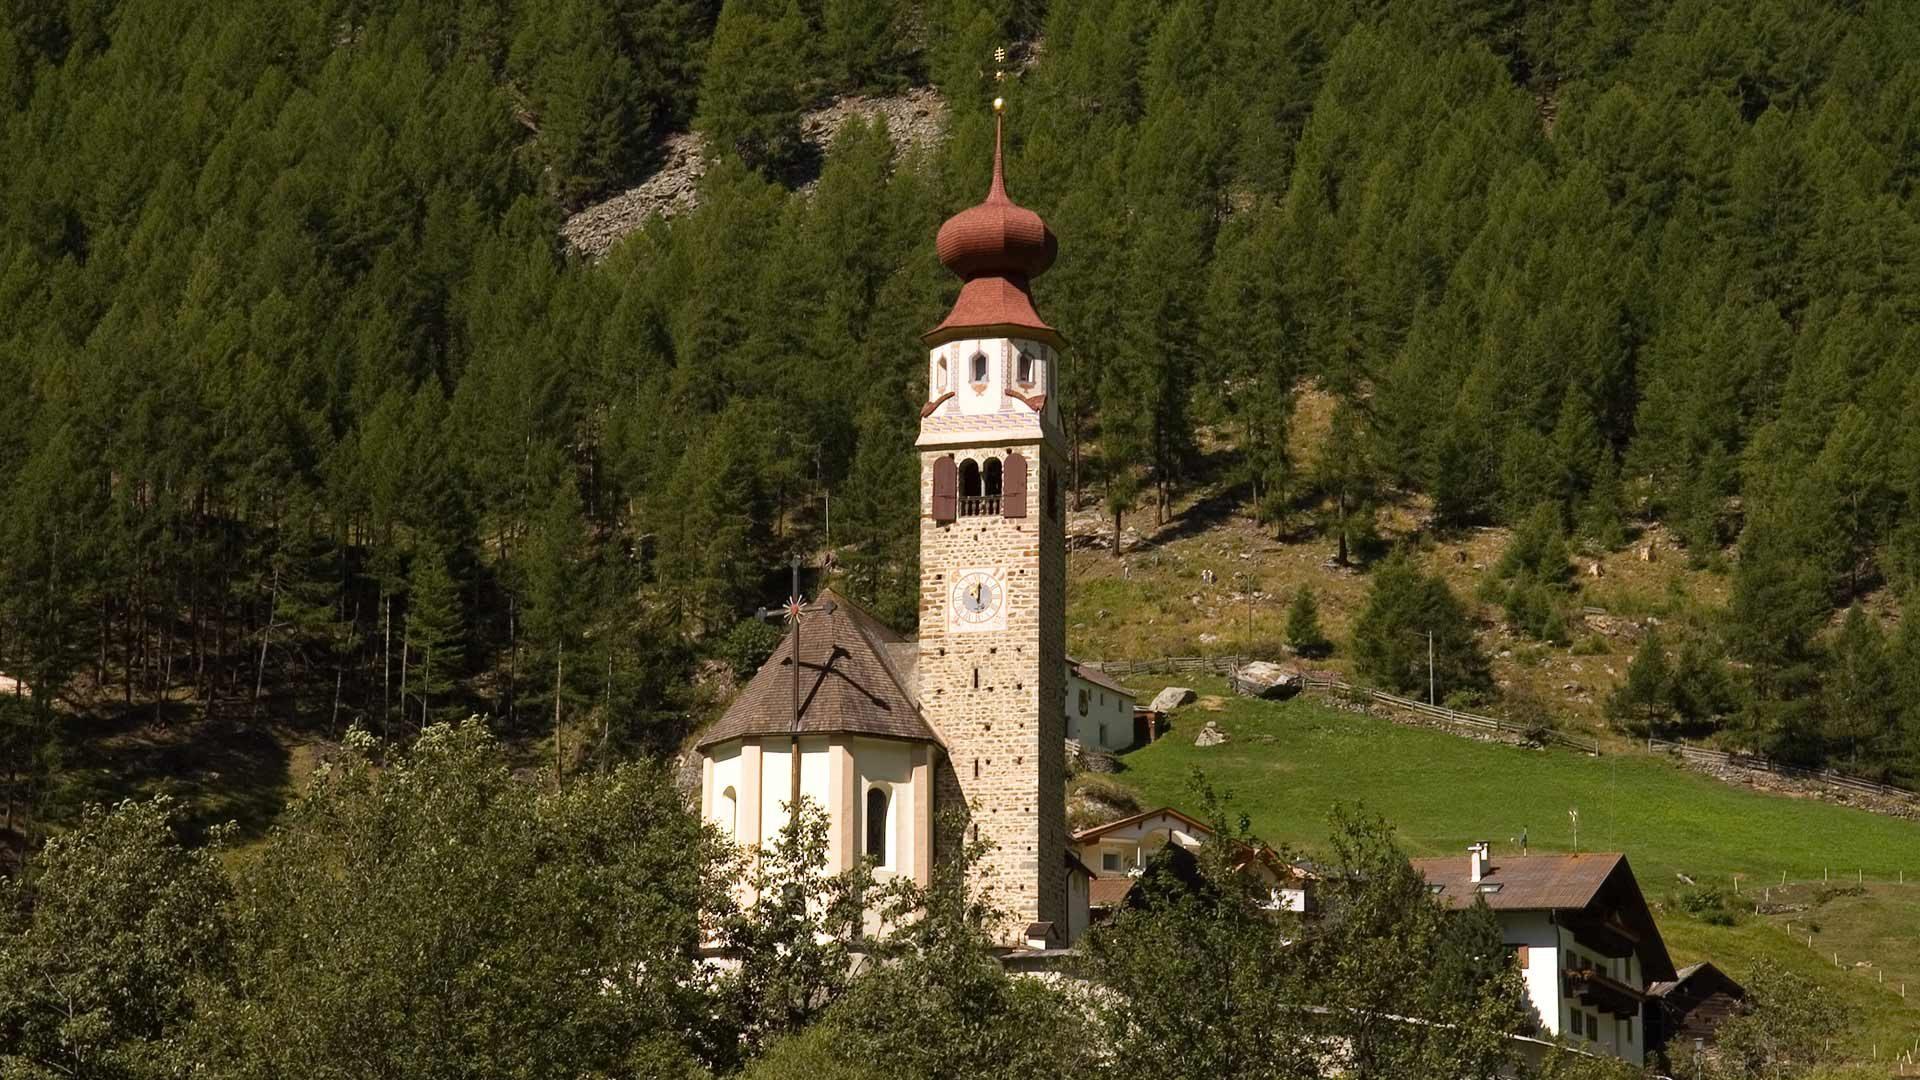 Chiesa in Val Senales